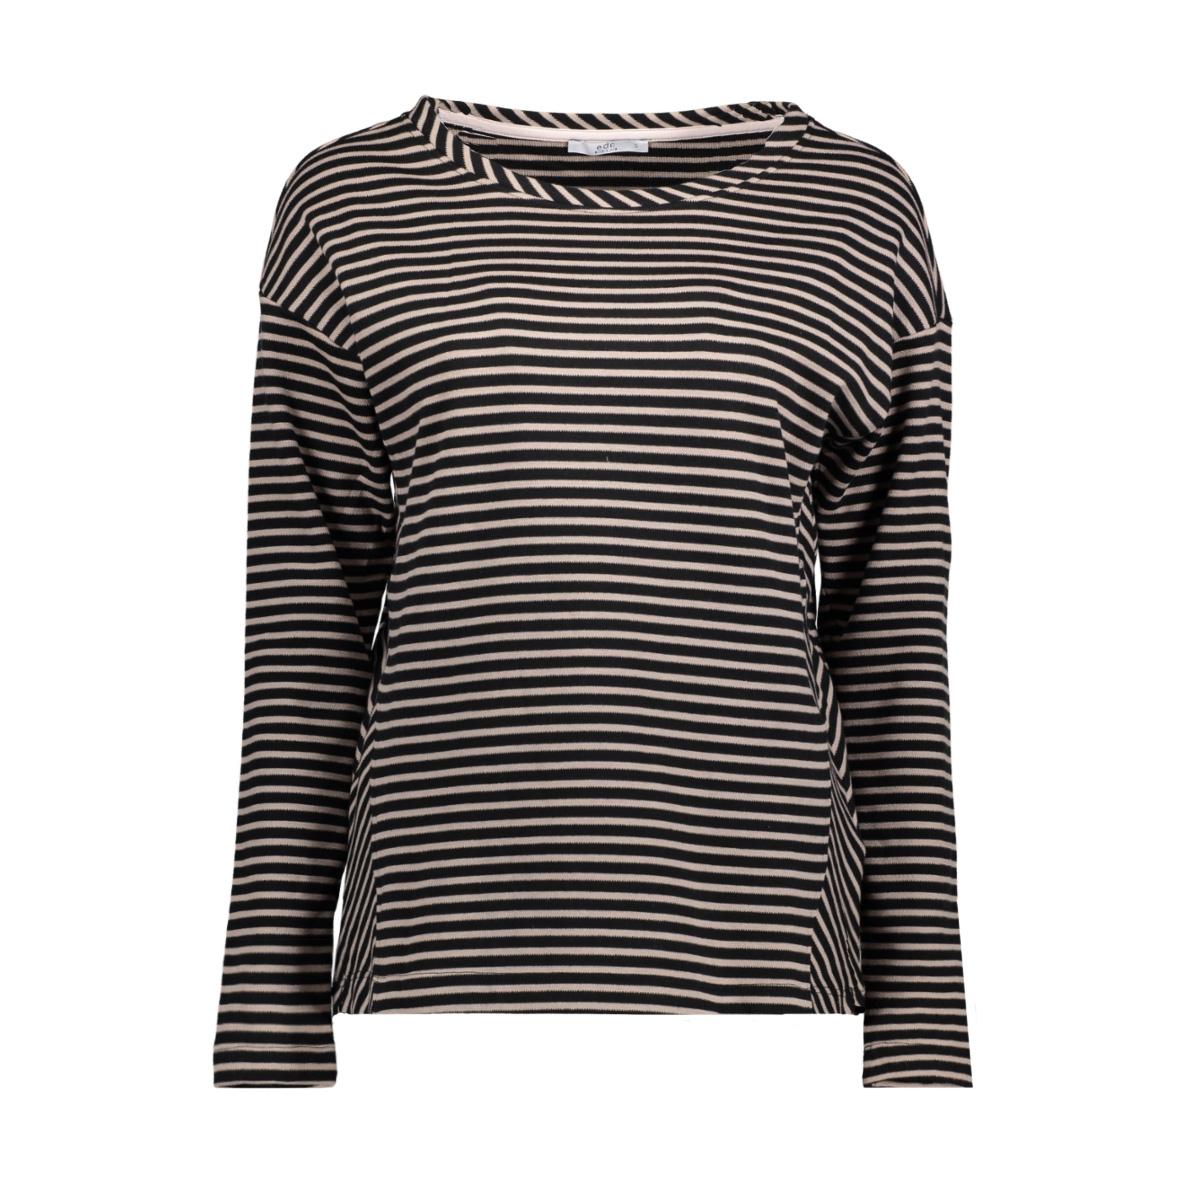 127cc1j017 edc sweater c001